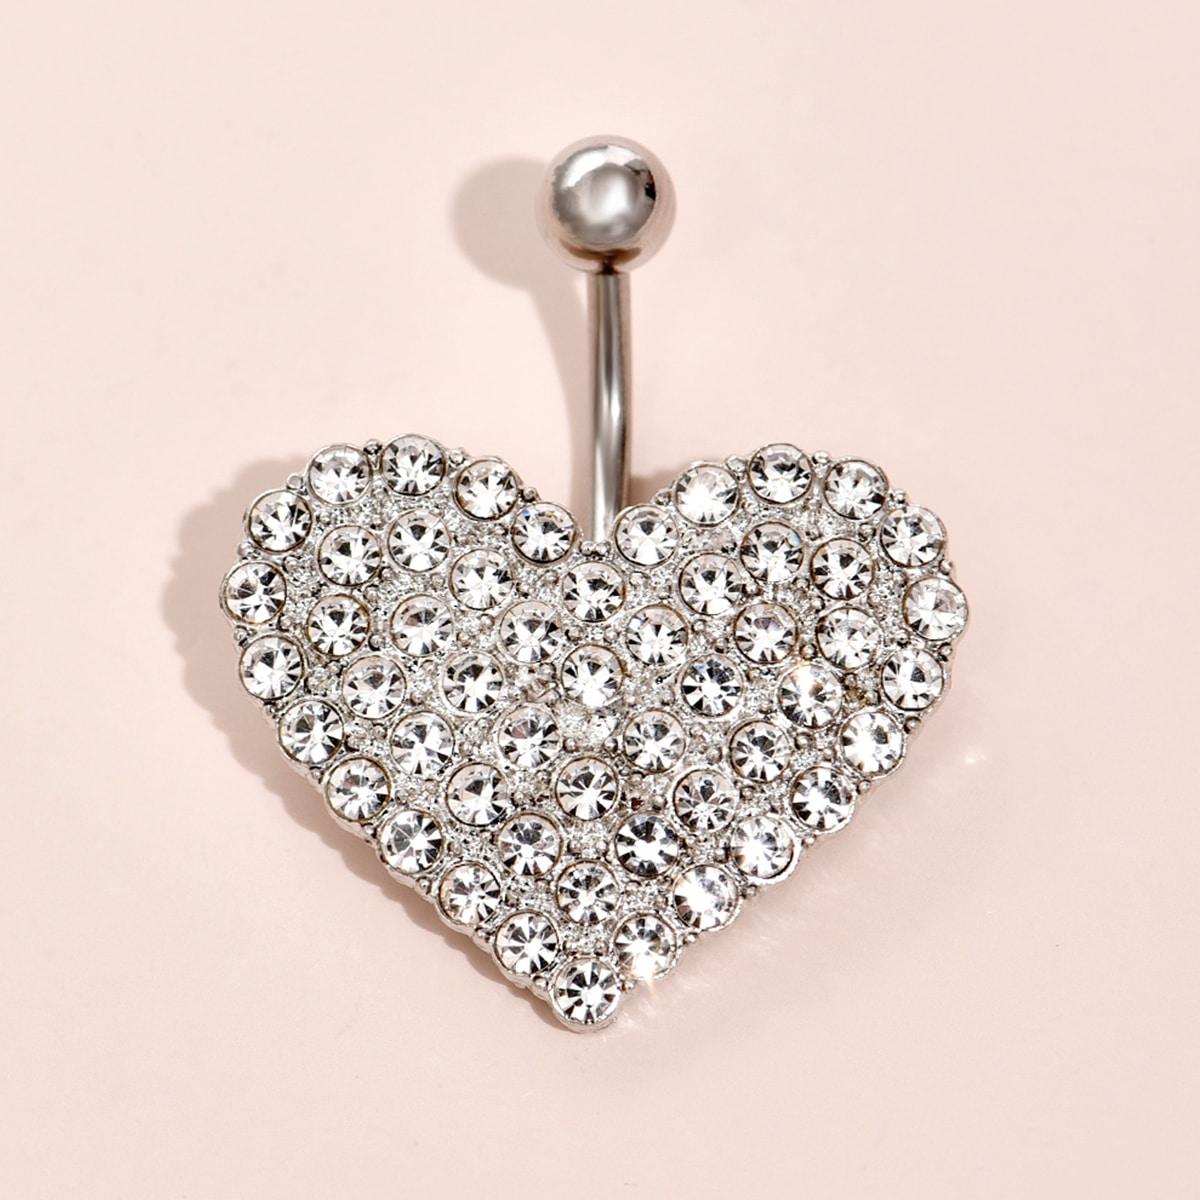 1 pieza barra de ombligo con corazón con diamante de imitación